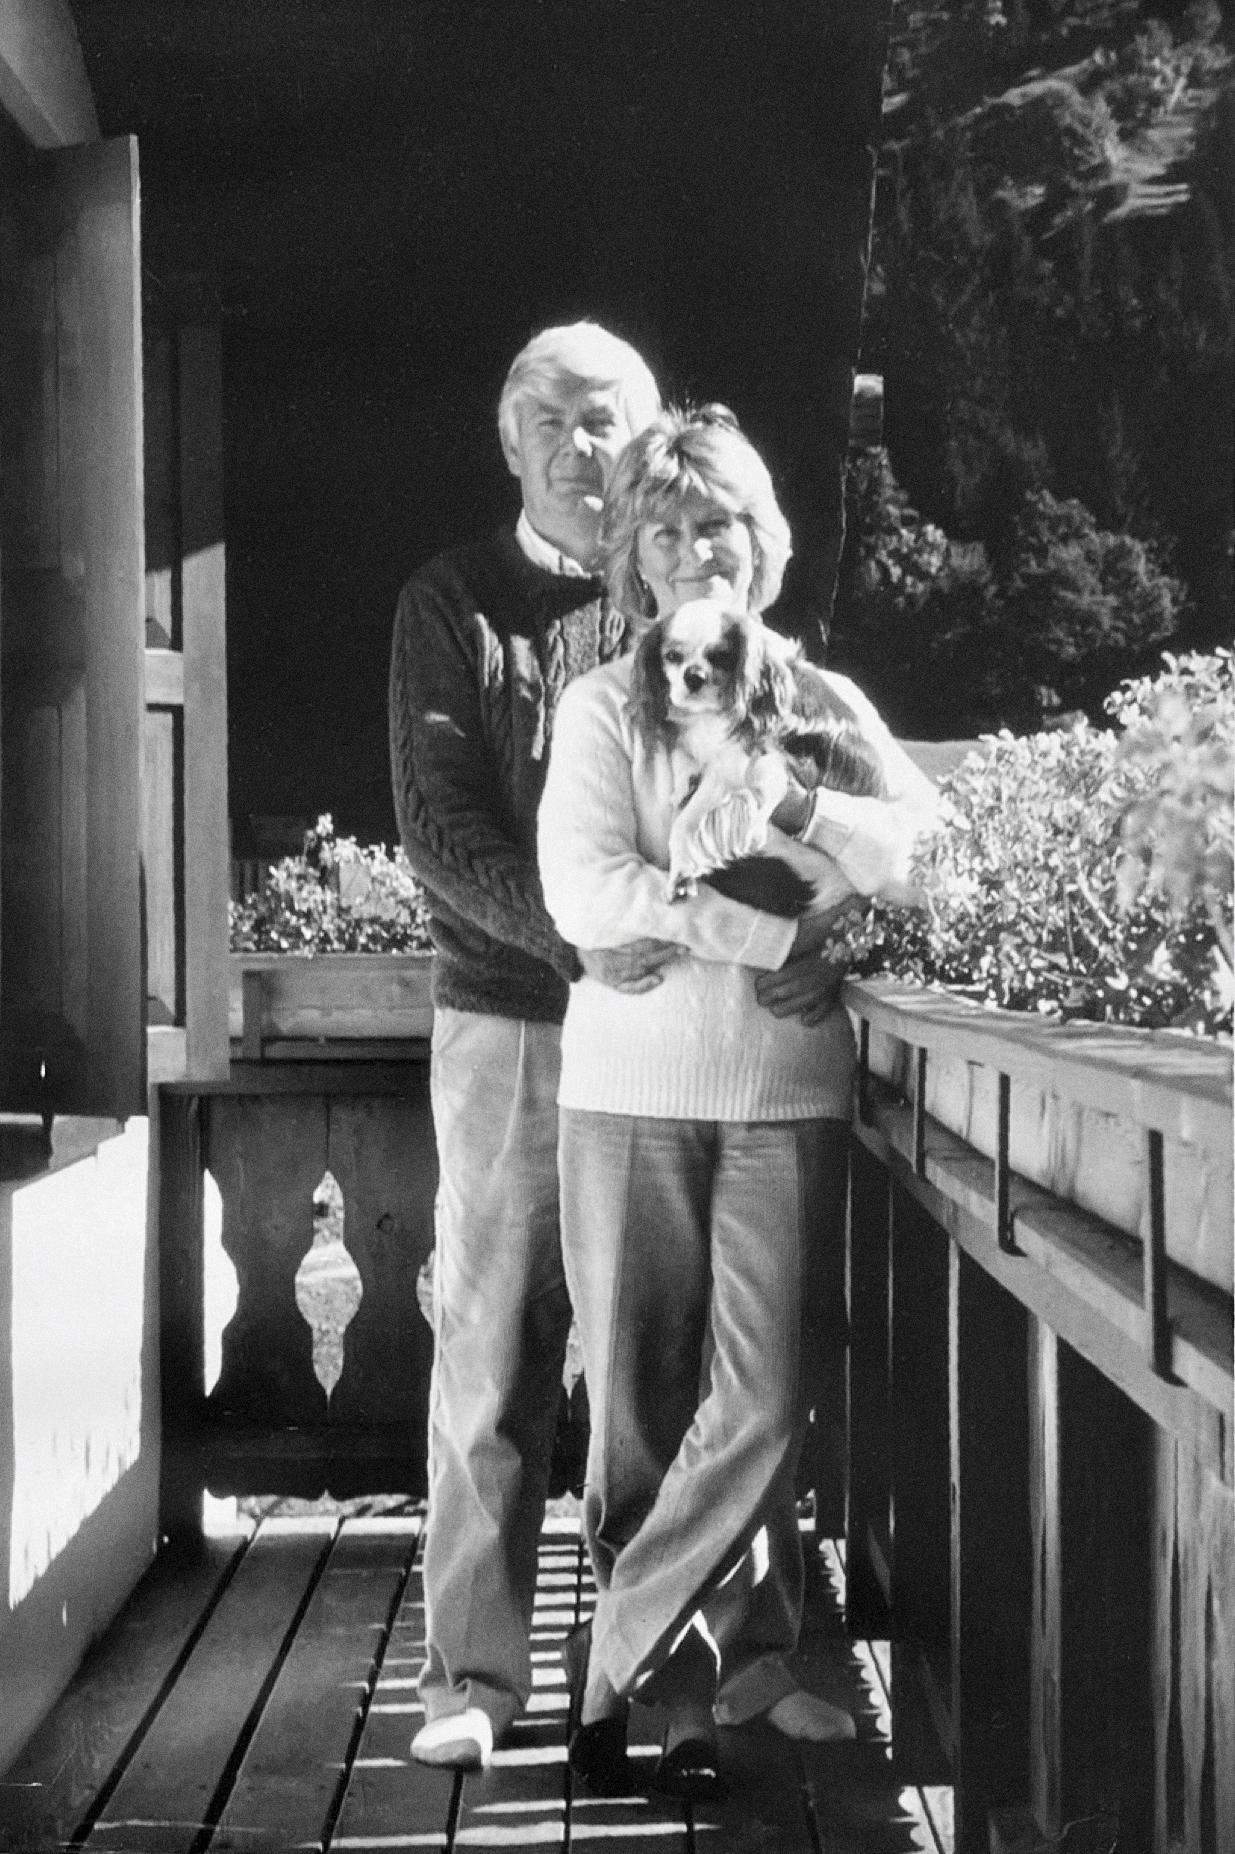 John B. Fairchild and Jill Fairchild